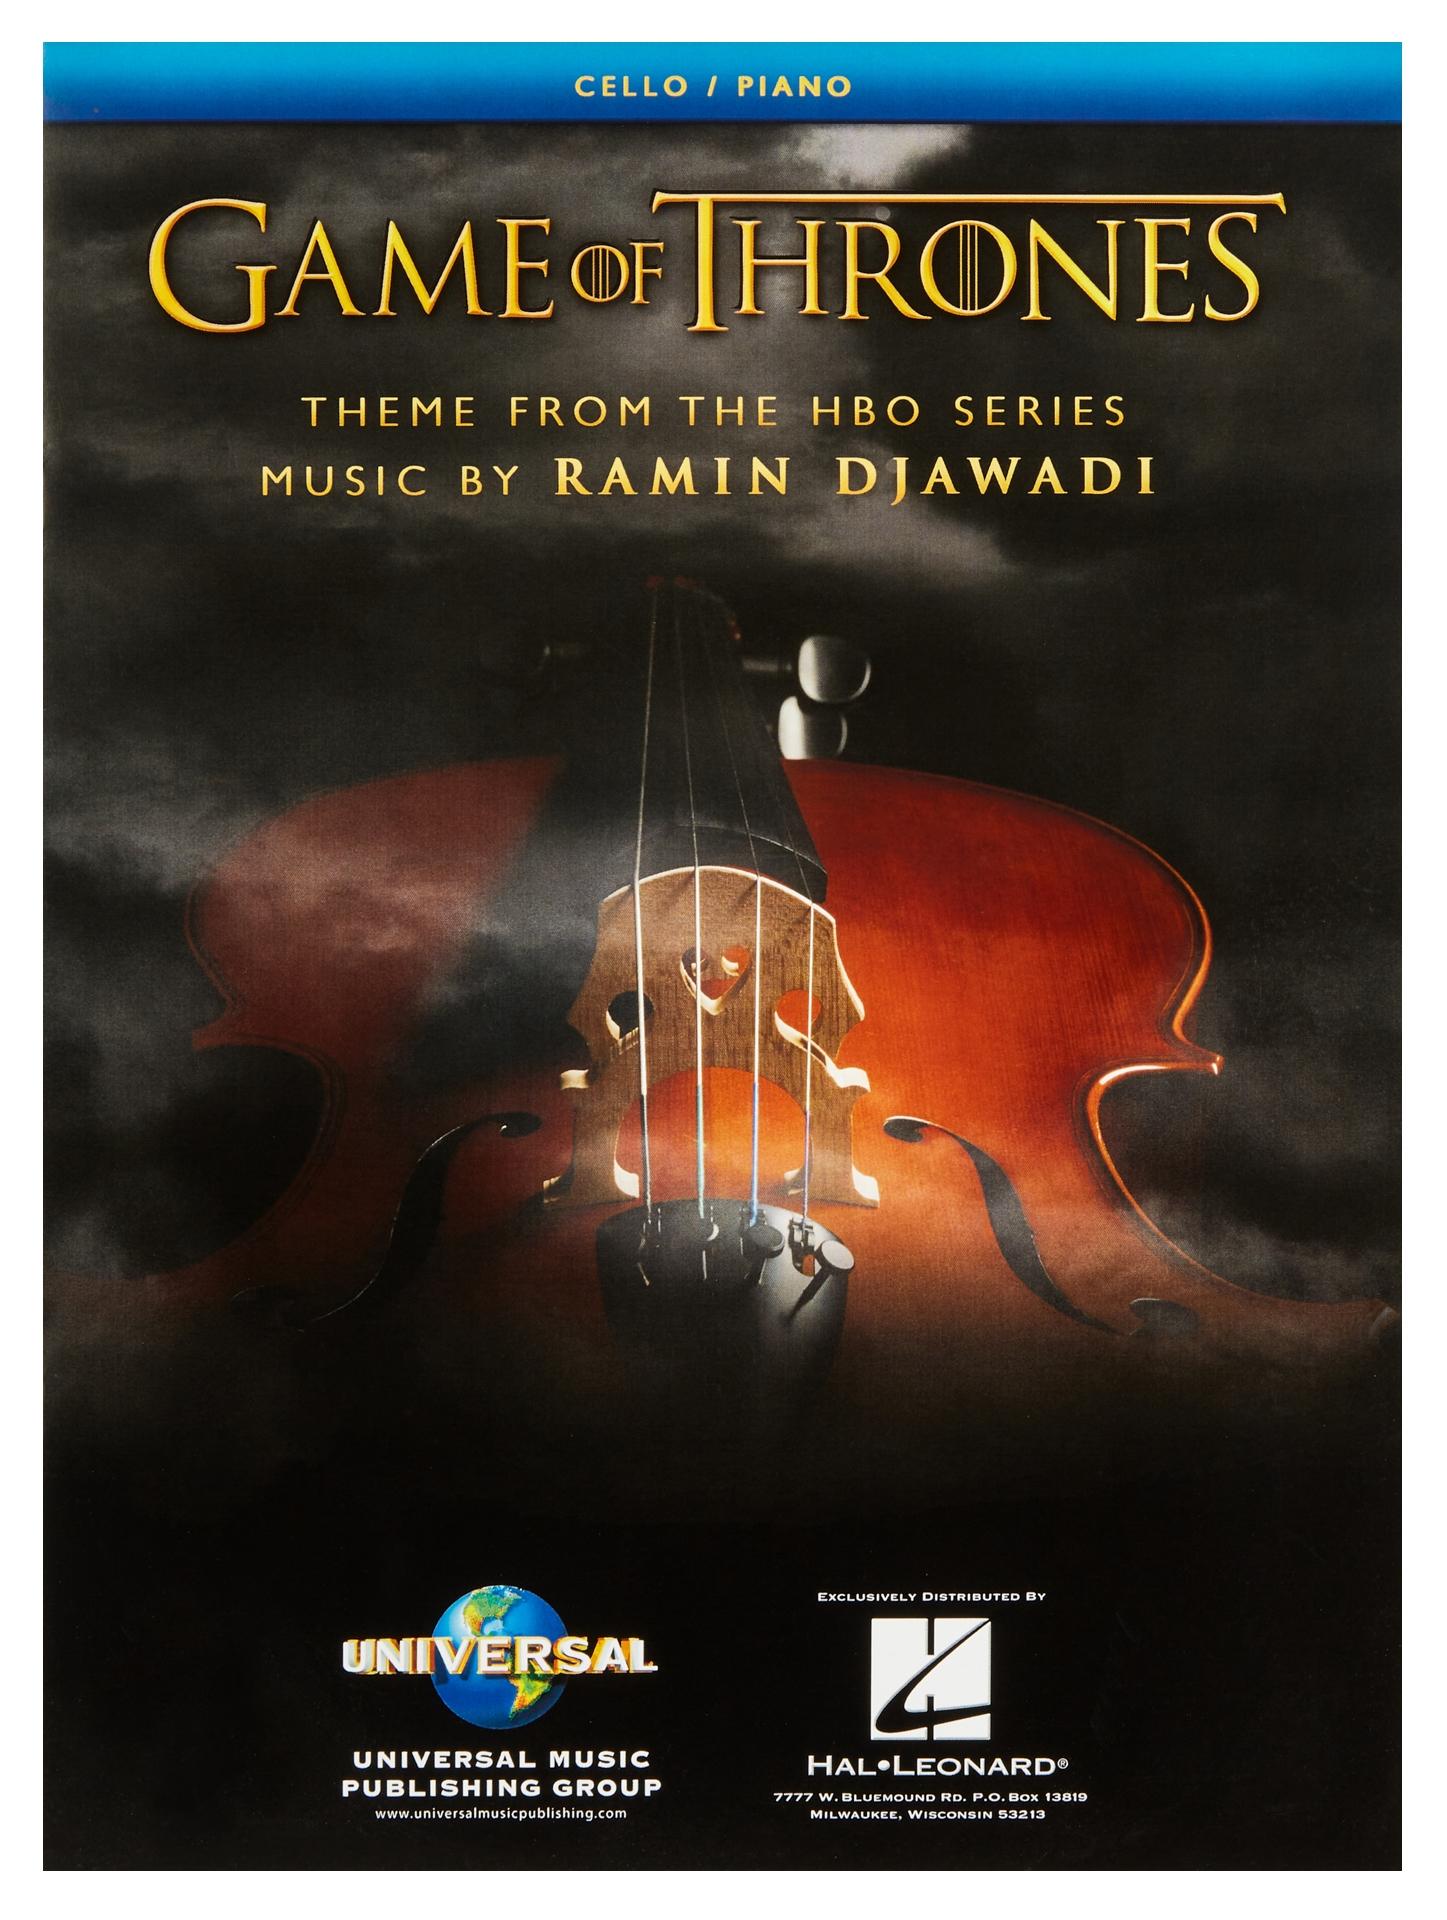 MS Game Of Thrones - Ramin Djawadi